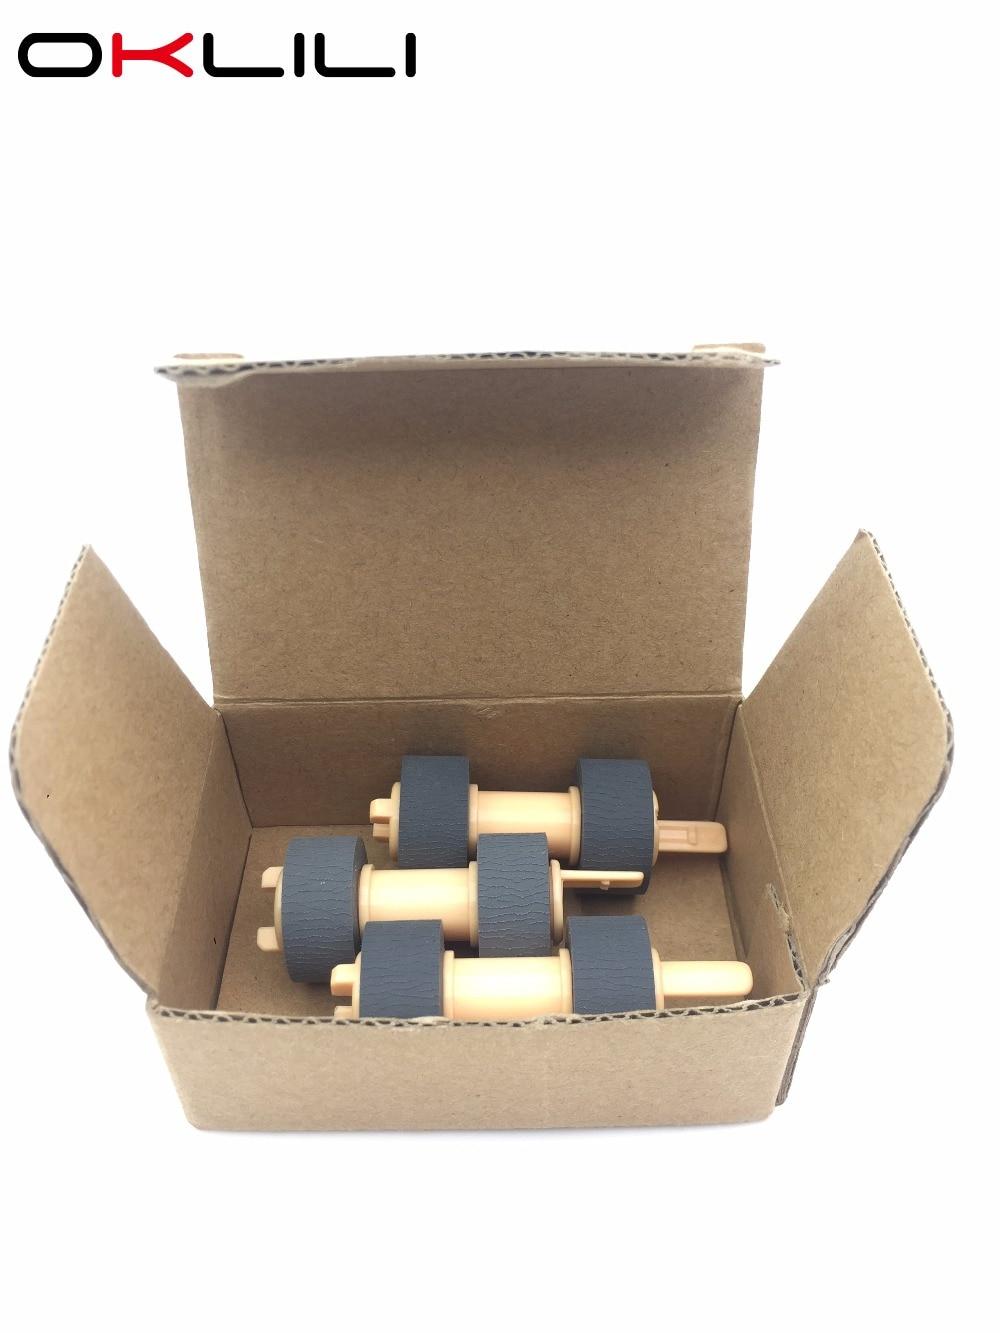 Paper Feed Kit Pickup Roller for OKI B6200 B6200N B6250N B6300 B6300N B6500 B6500N B710DN B710N for Xerox 4500 4510 7100DN 7100N 2set feed roller adf pickup roller for samsung scx4521 scx4720 scx4725 scx5530 scx5635 scx6345